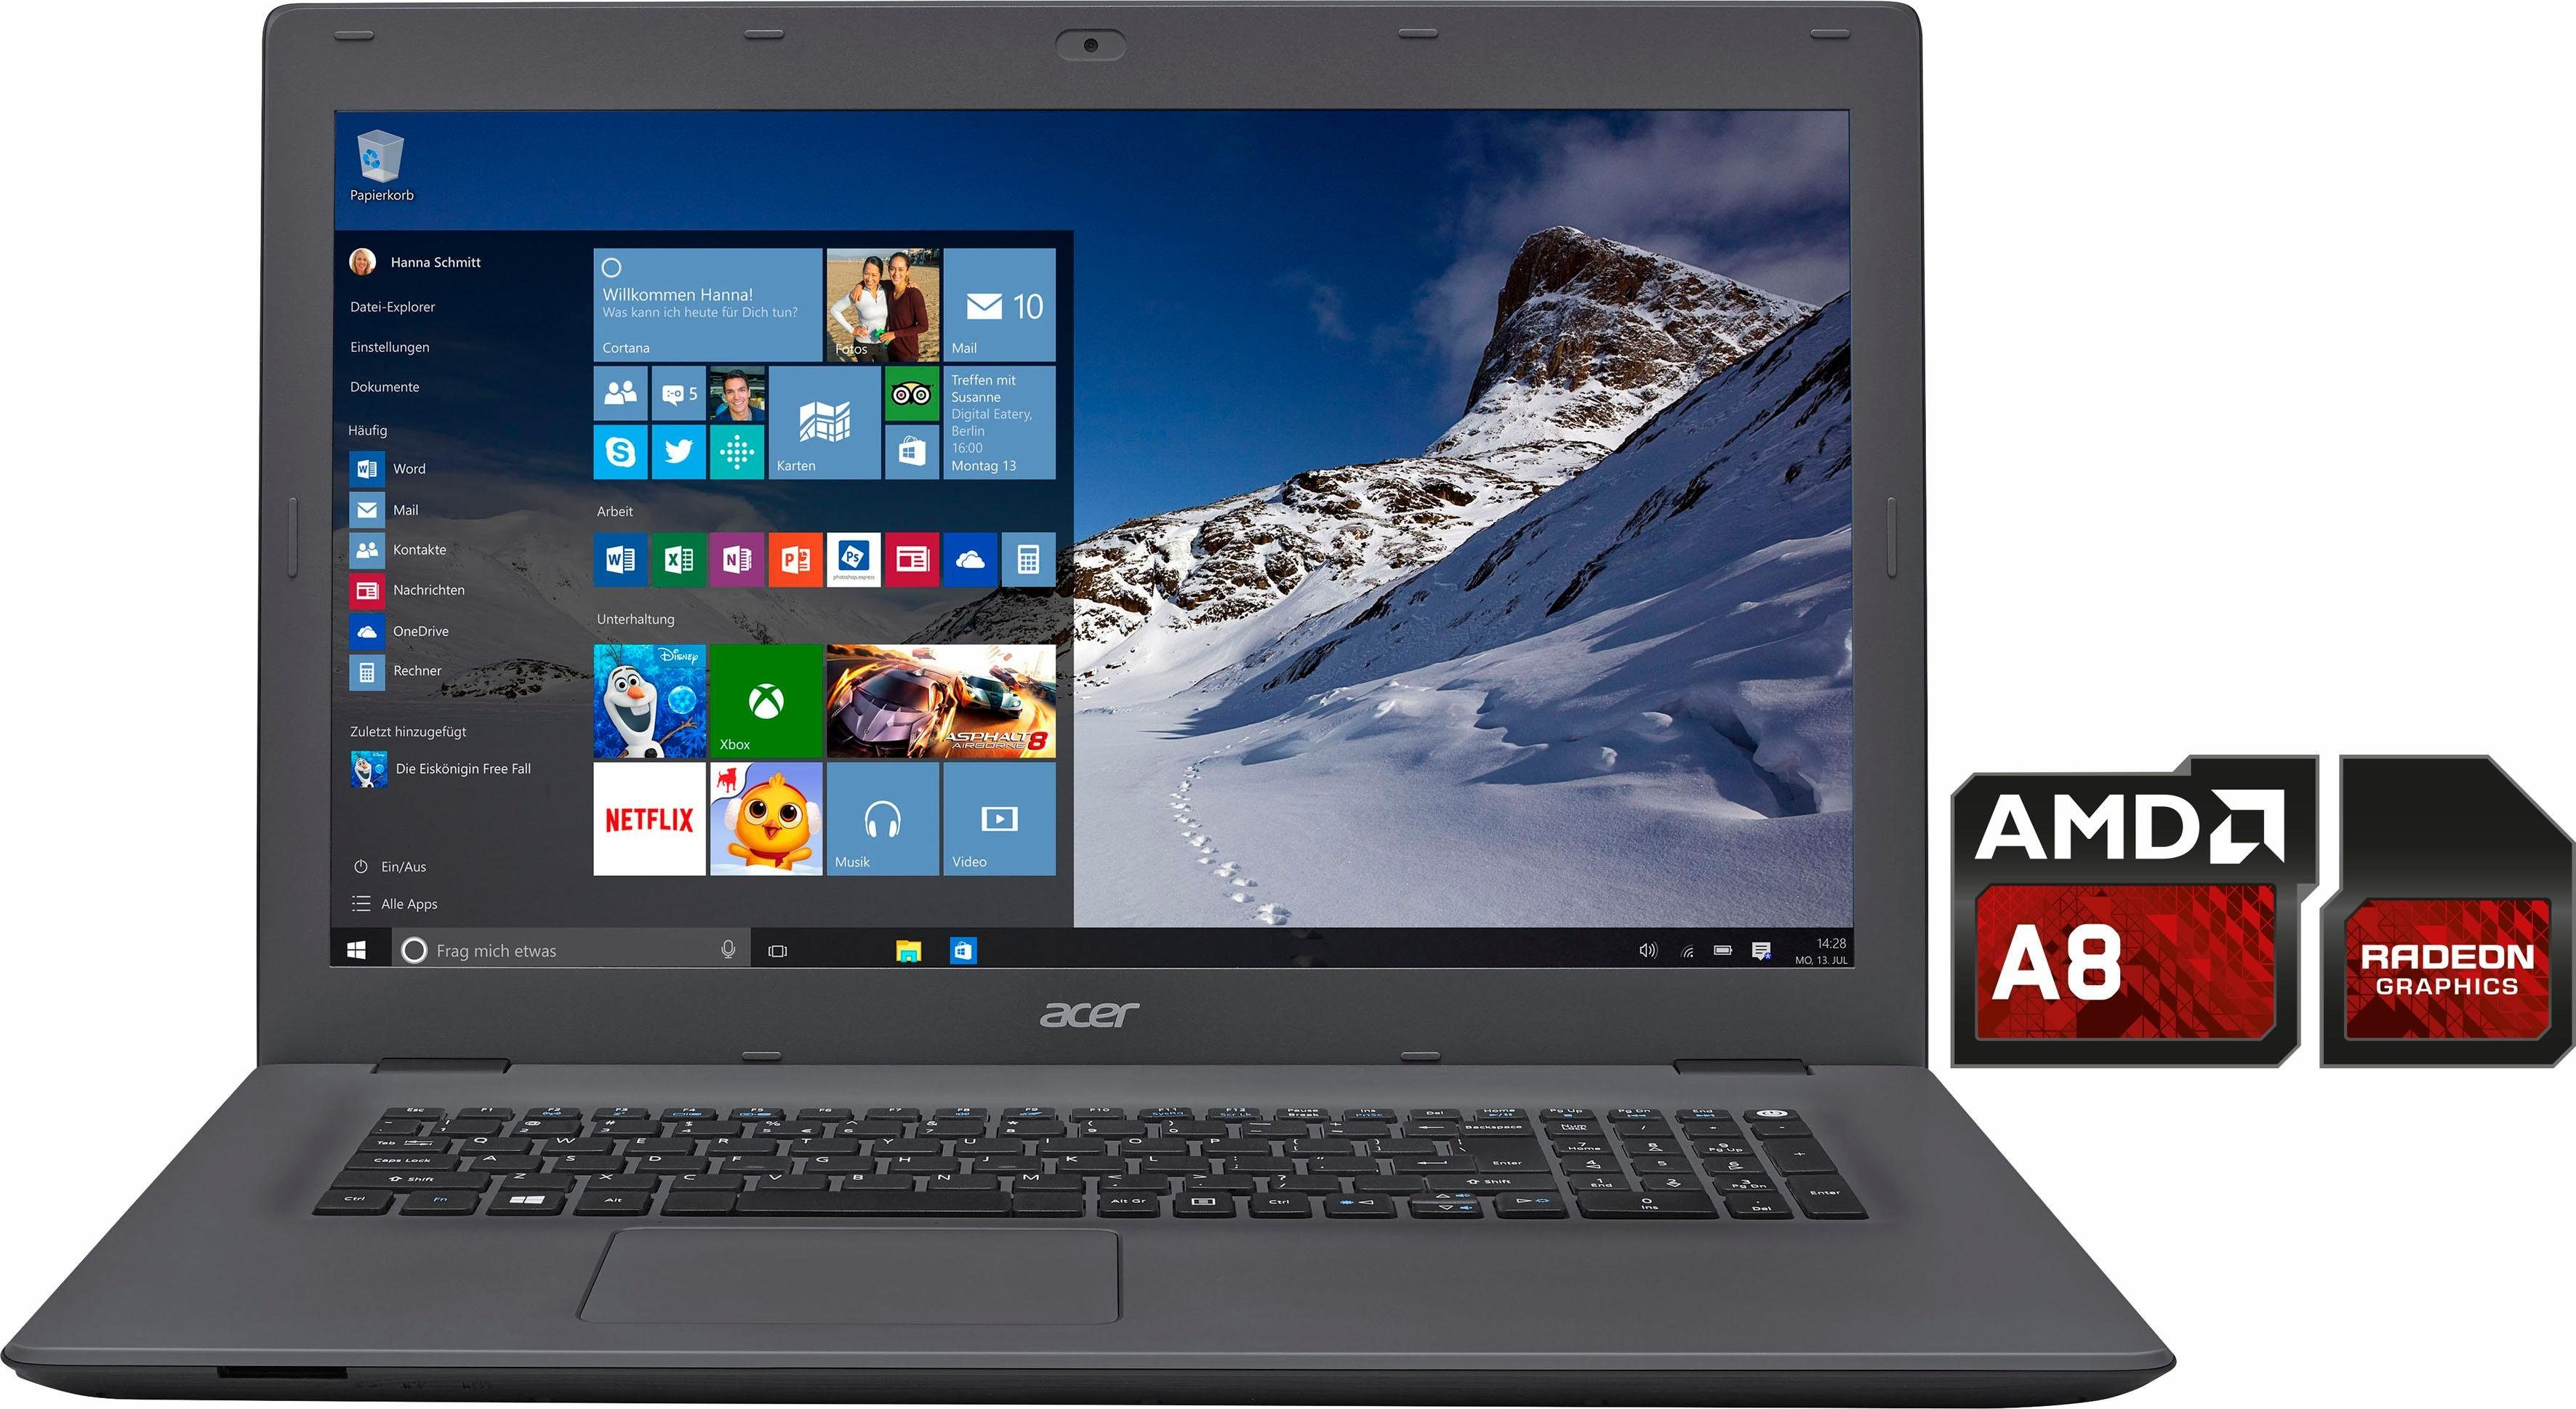 Acer Aspire E5-722-89L4 Notebook, AMD A8, 43,9 cm (17,3 Zoll), 1000 GB Speicher, 8192 MB DDR3L